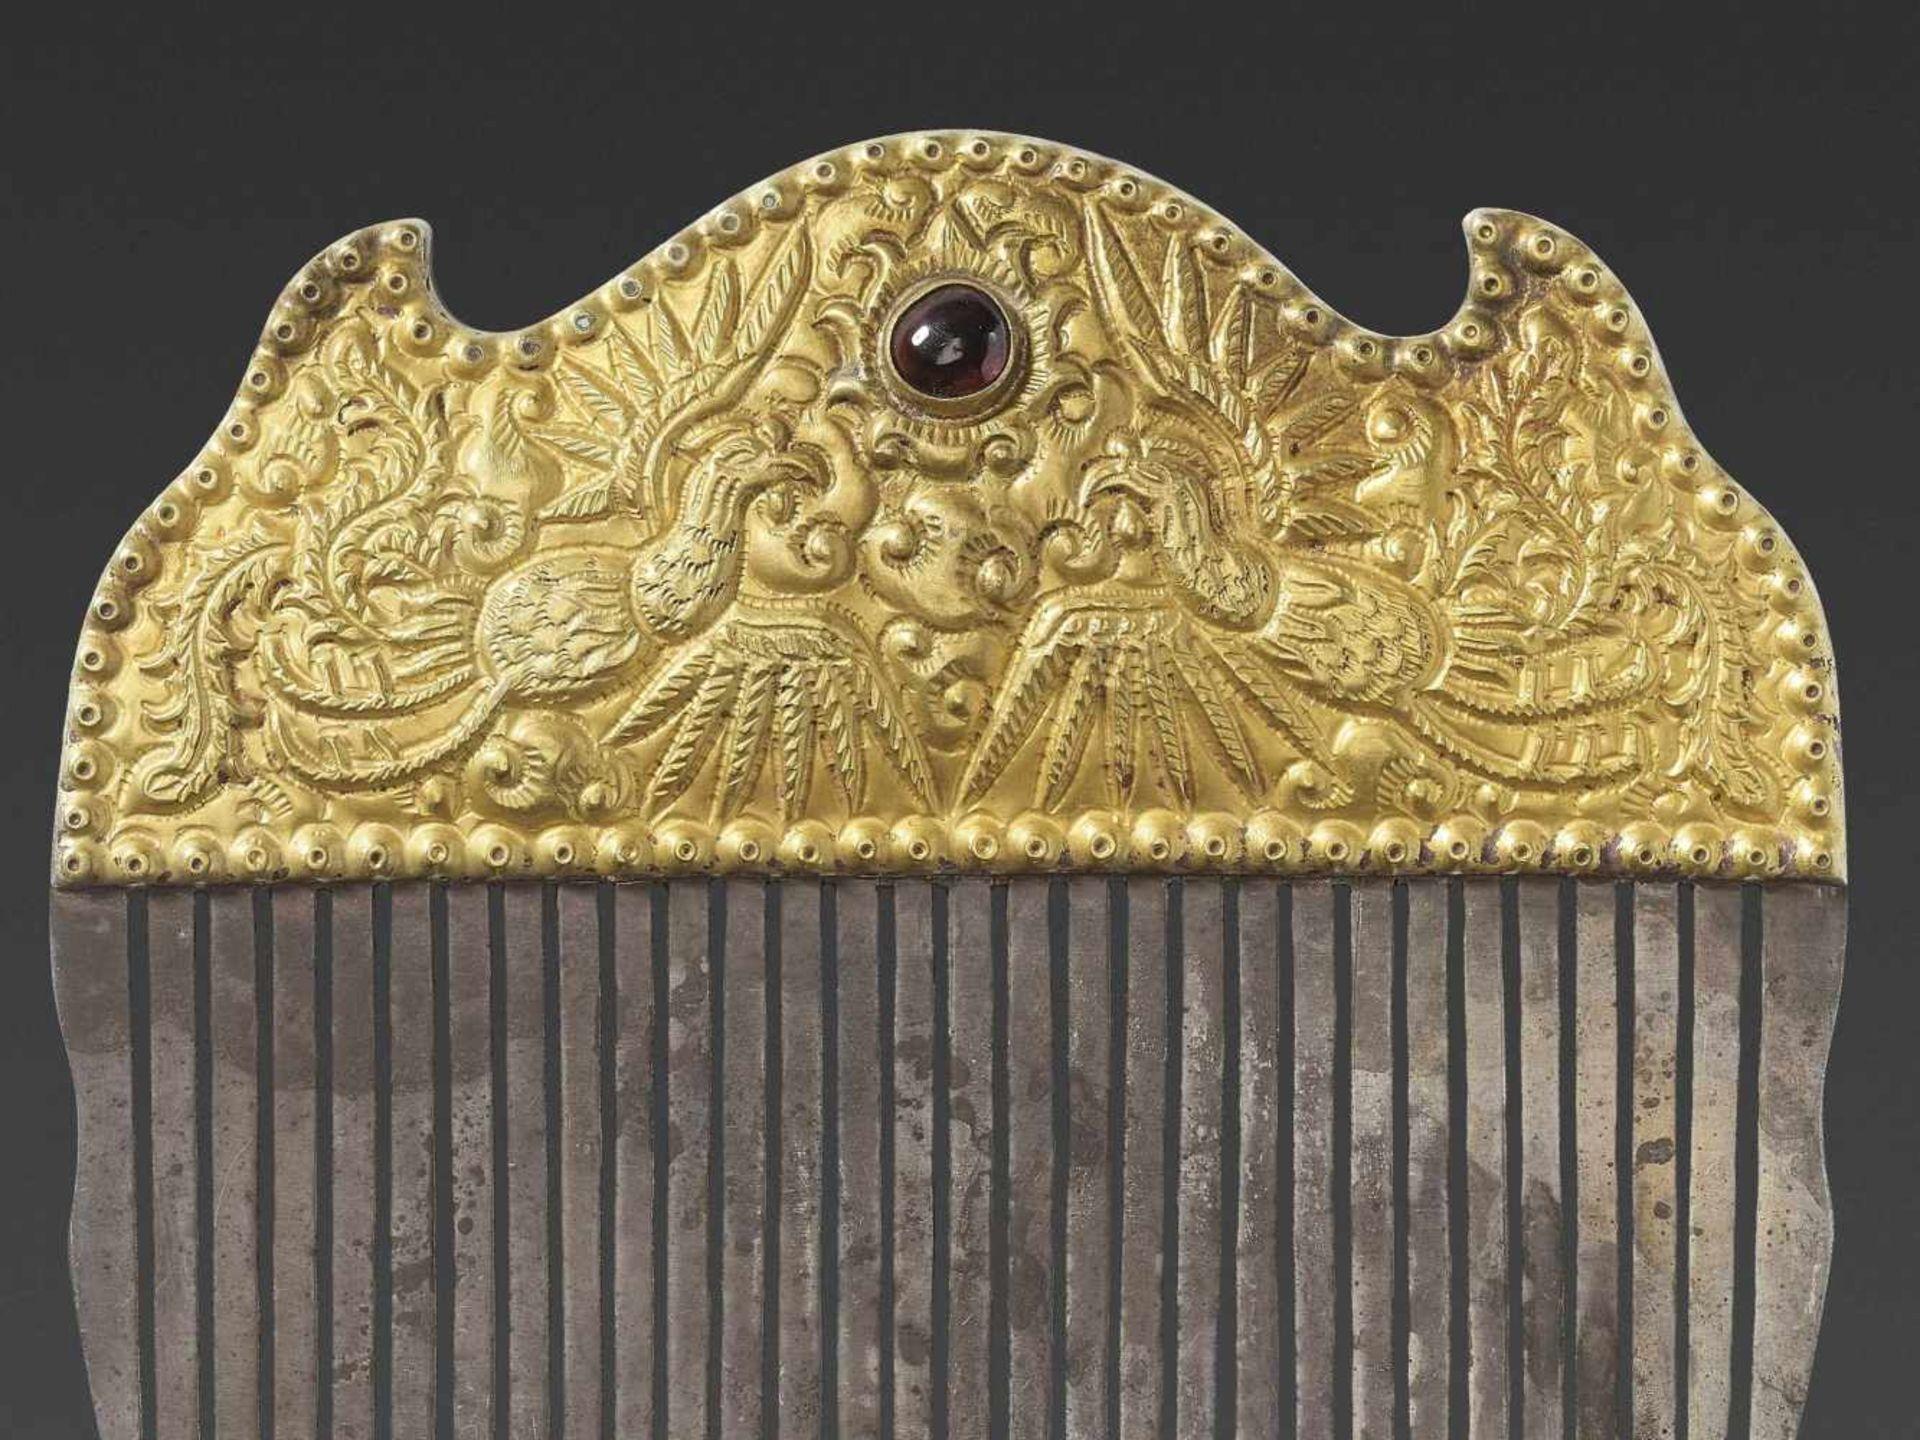 A VIETNAMESE GEMSTONE-SET GOLD REPOUSSÉ AND SILVER HAIR COMB WITH PHOENIXES - Bild 3 aus 5